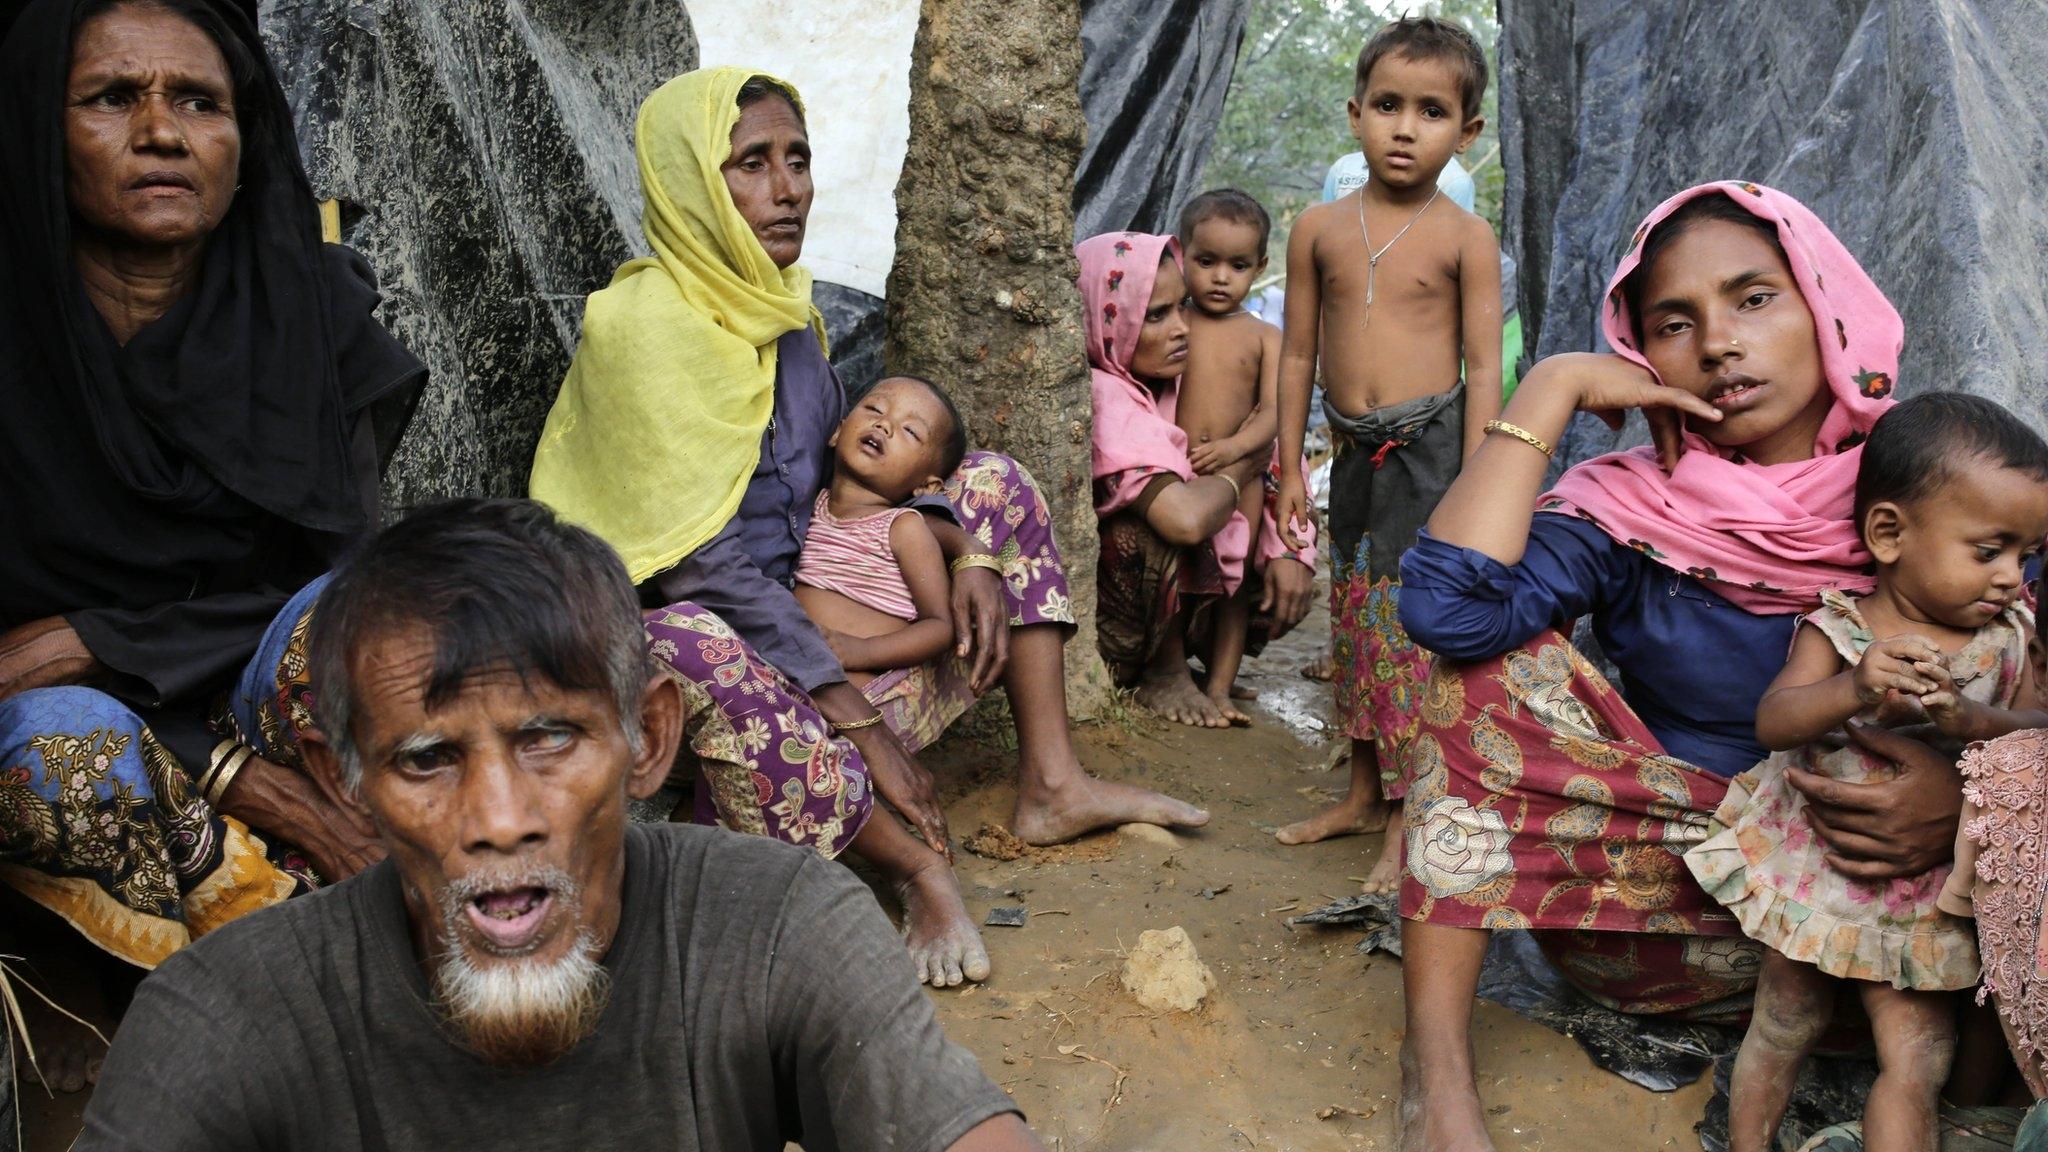 Amnesty condemns Rohingya relocation plan